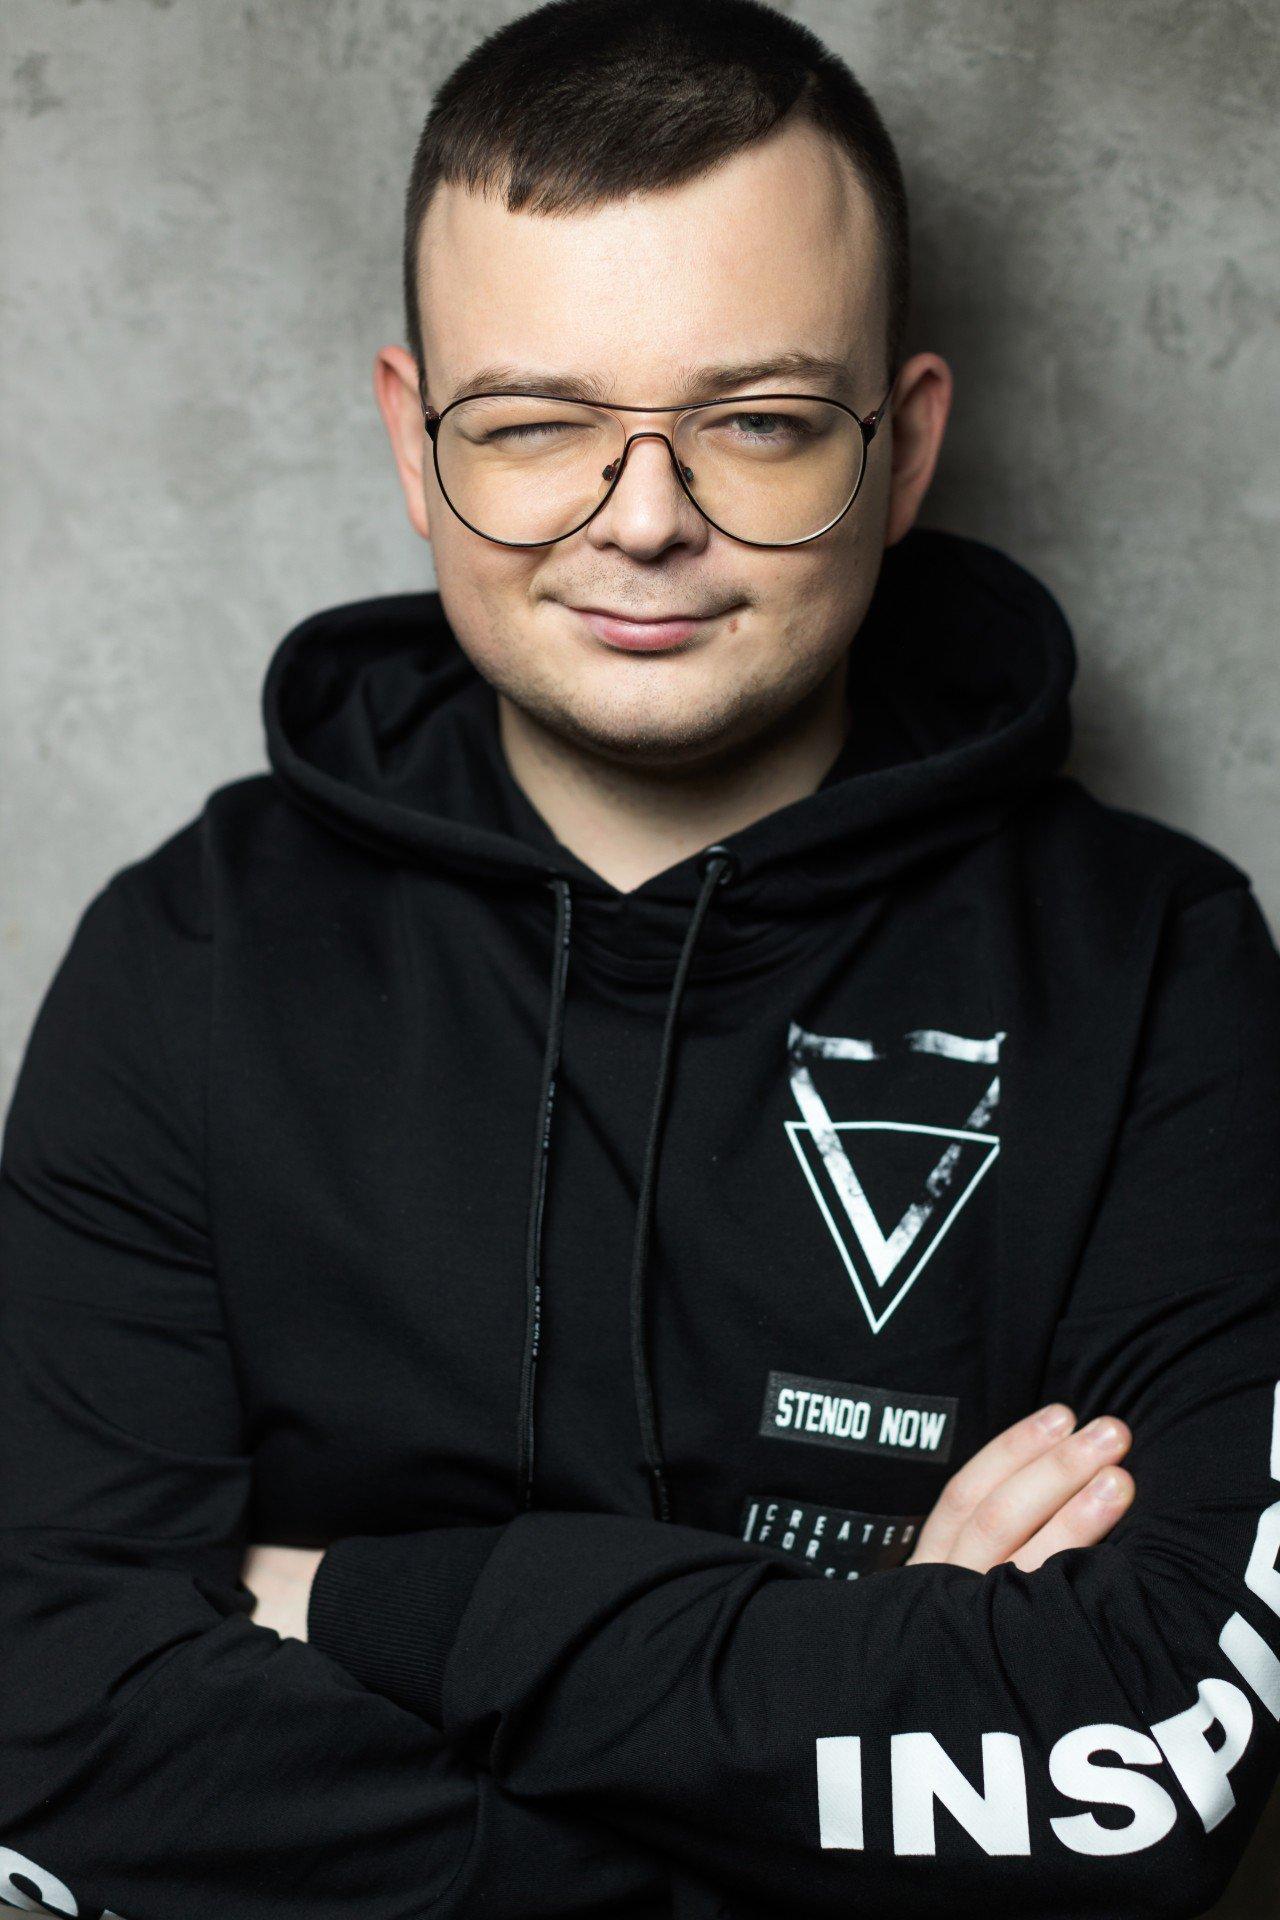 Maksym Bilonogov